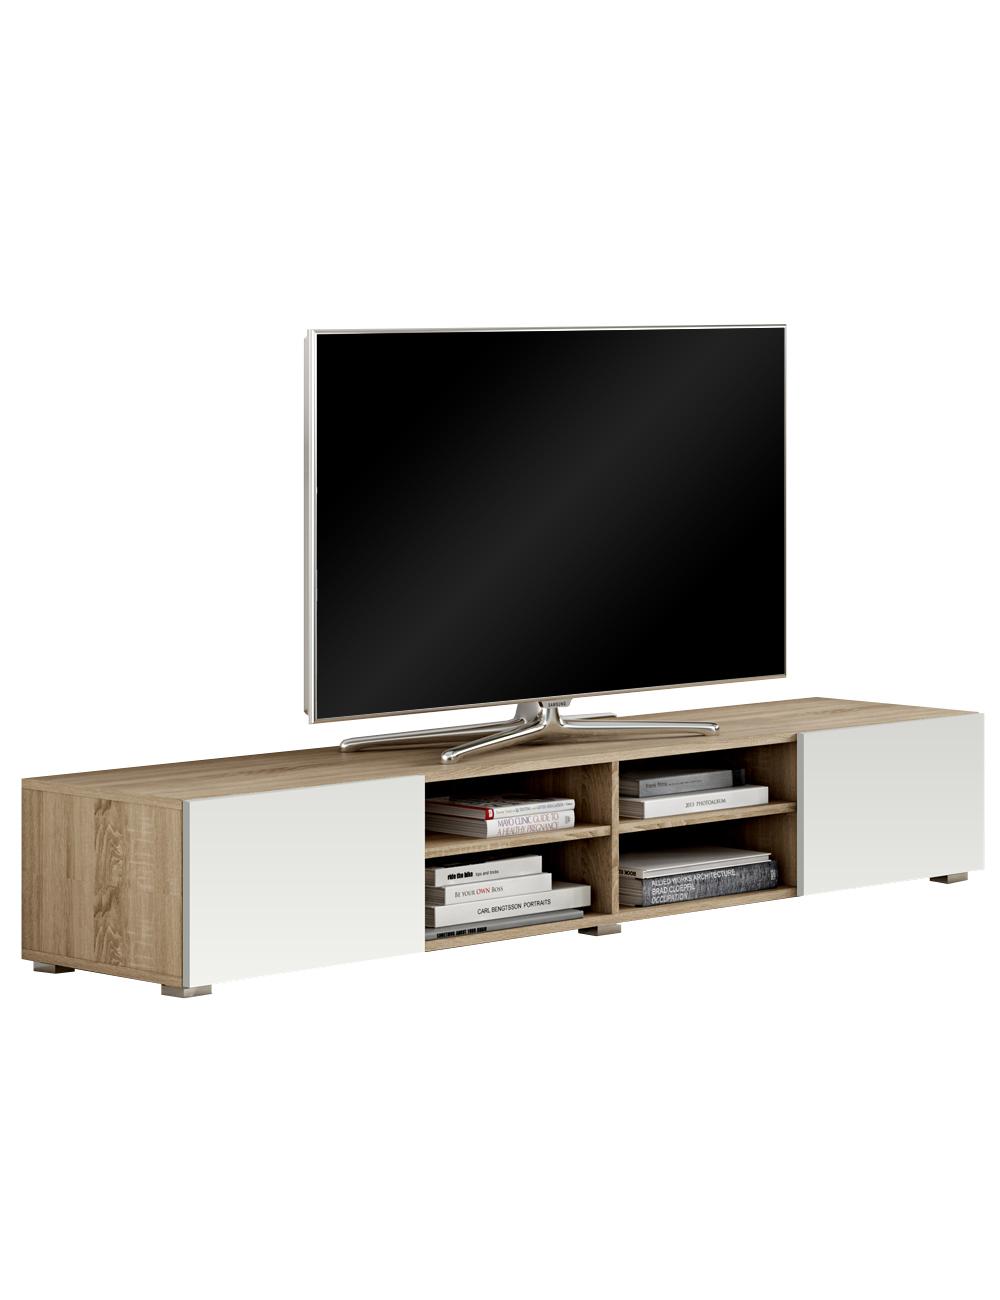 matelas prestige 7 zones confort garanti 180 x 200 cm. Black Bedroom Furniture Sets. Home Design Ideas